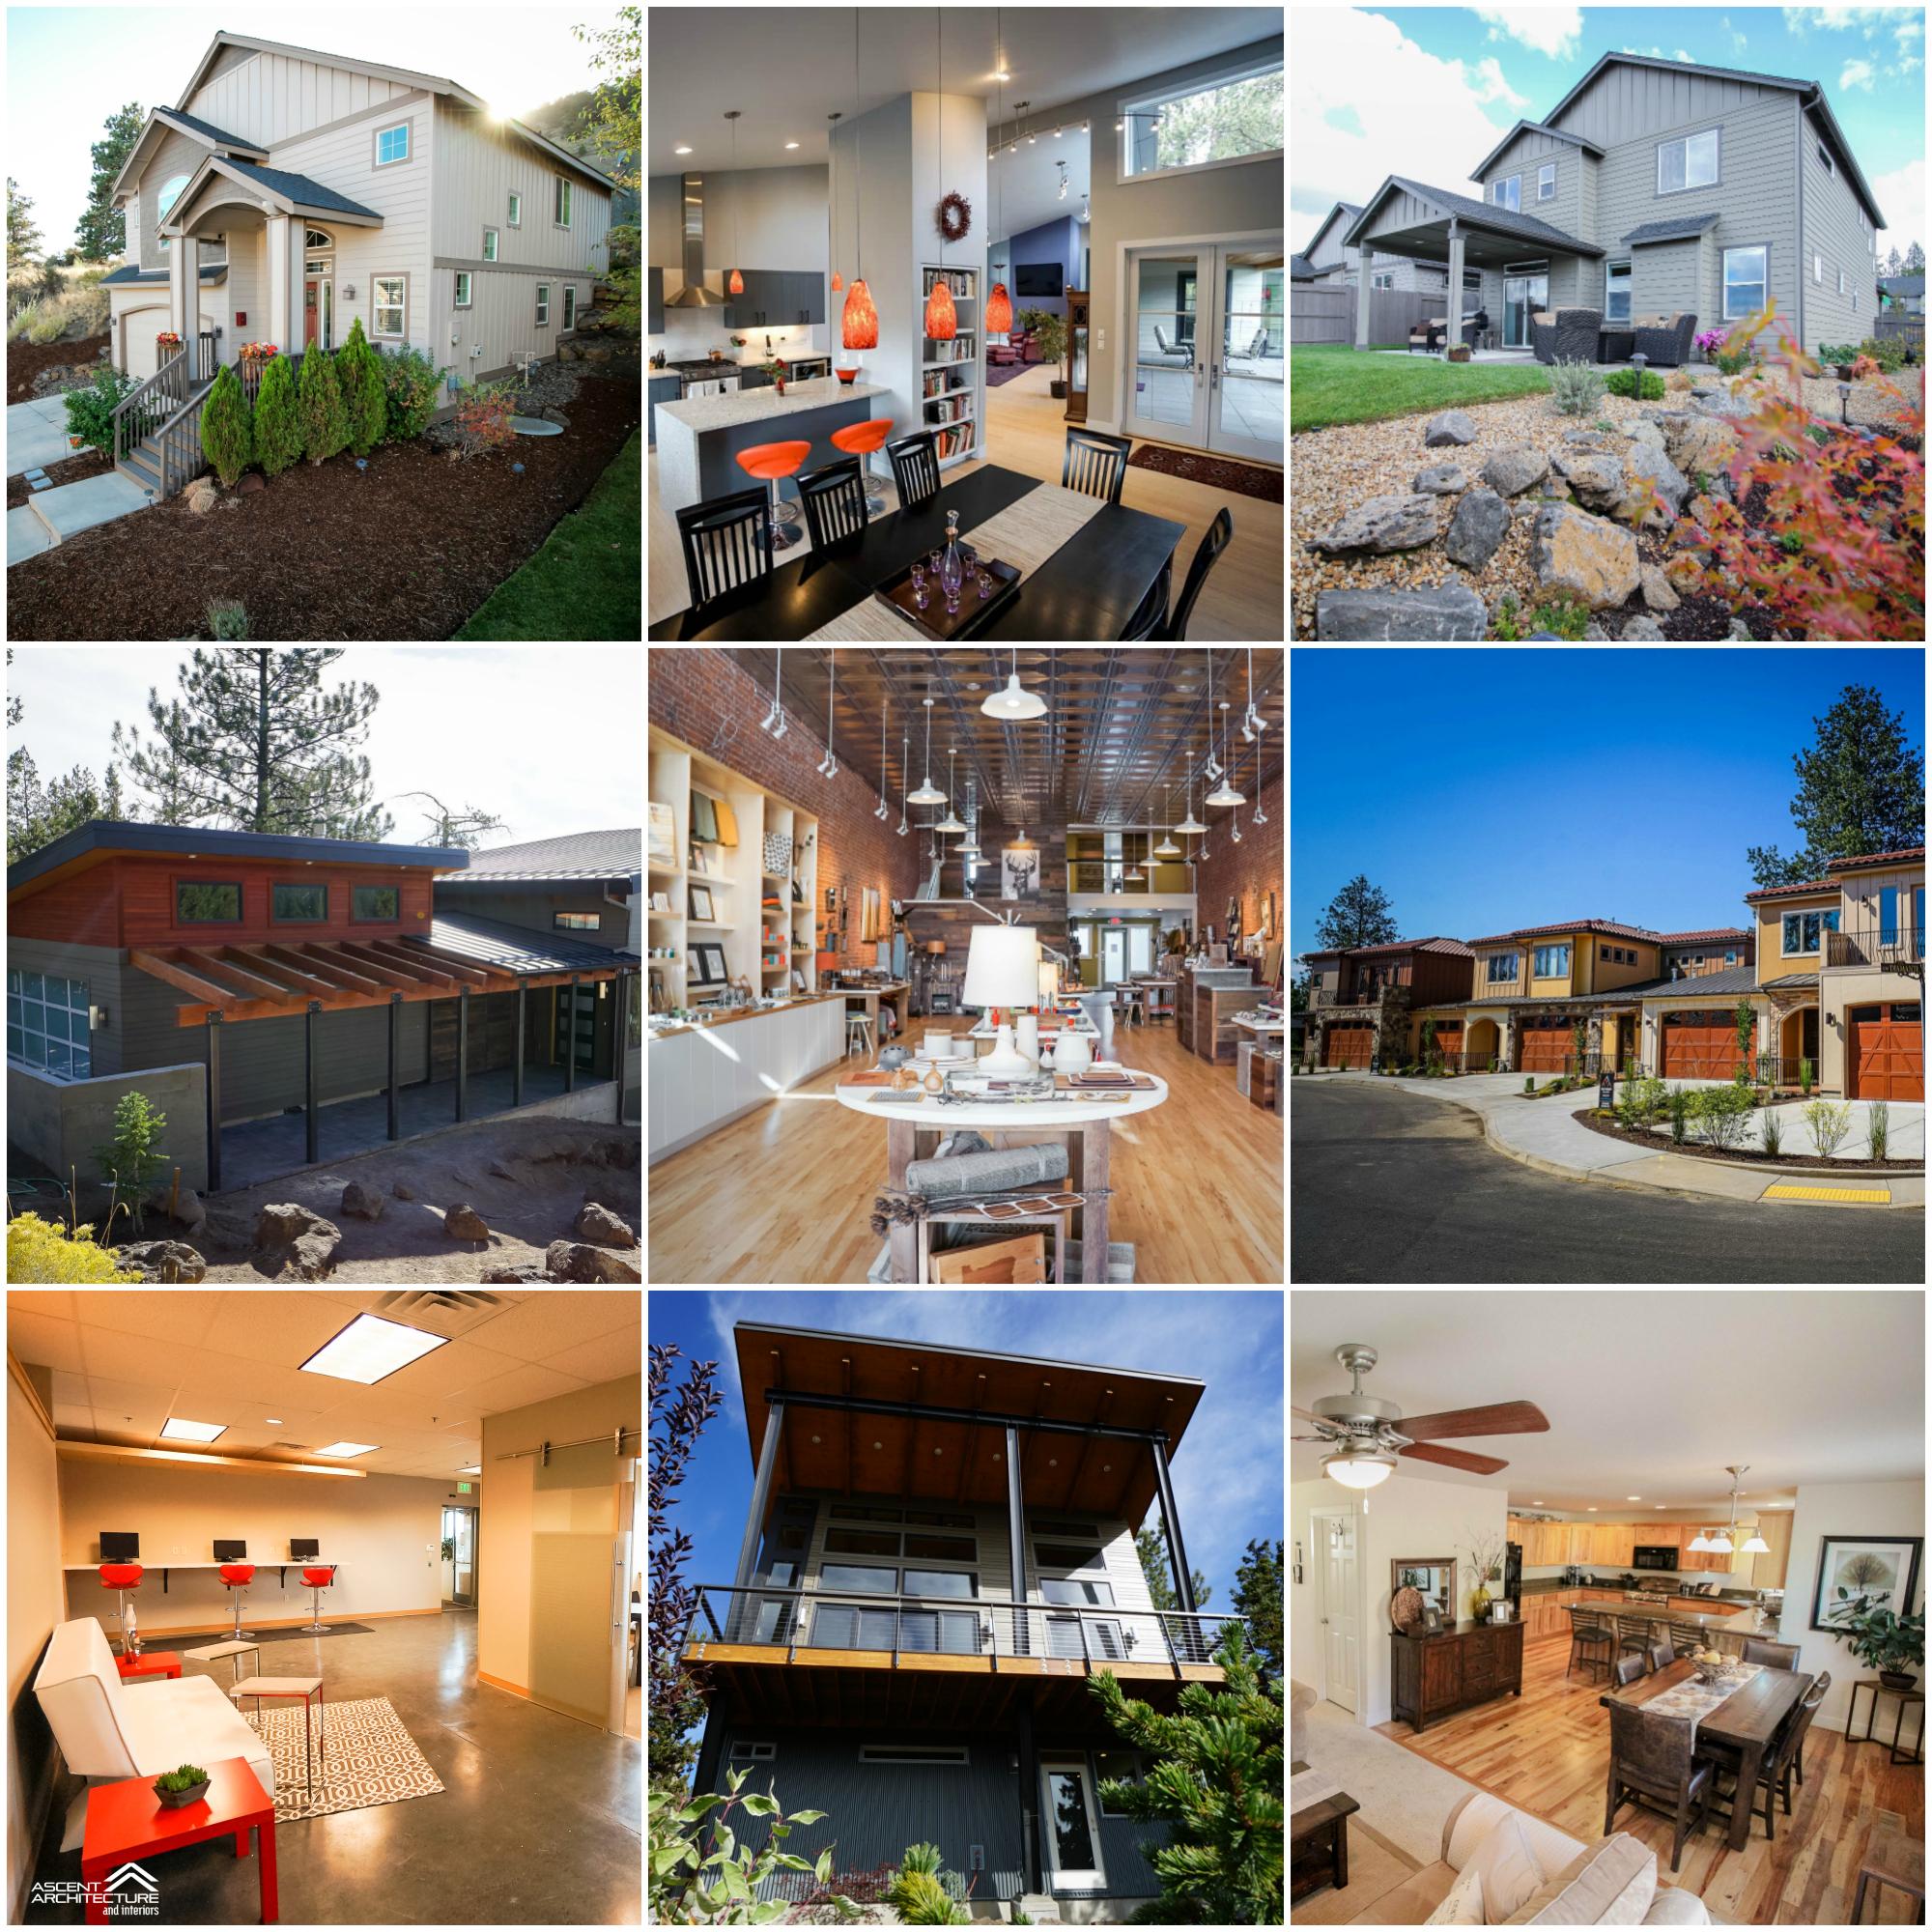 real estate - $225